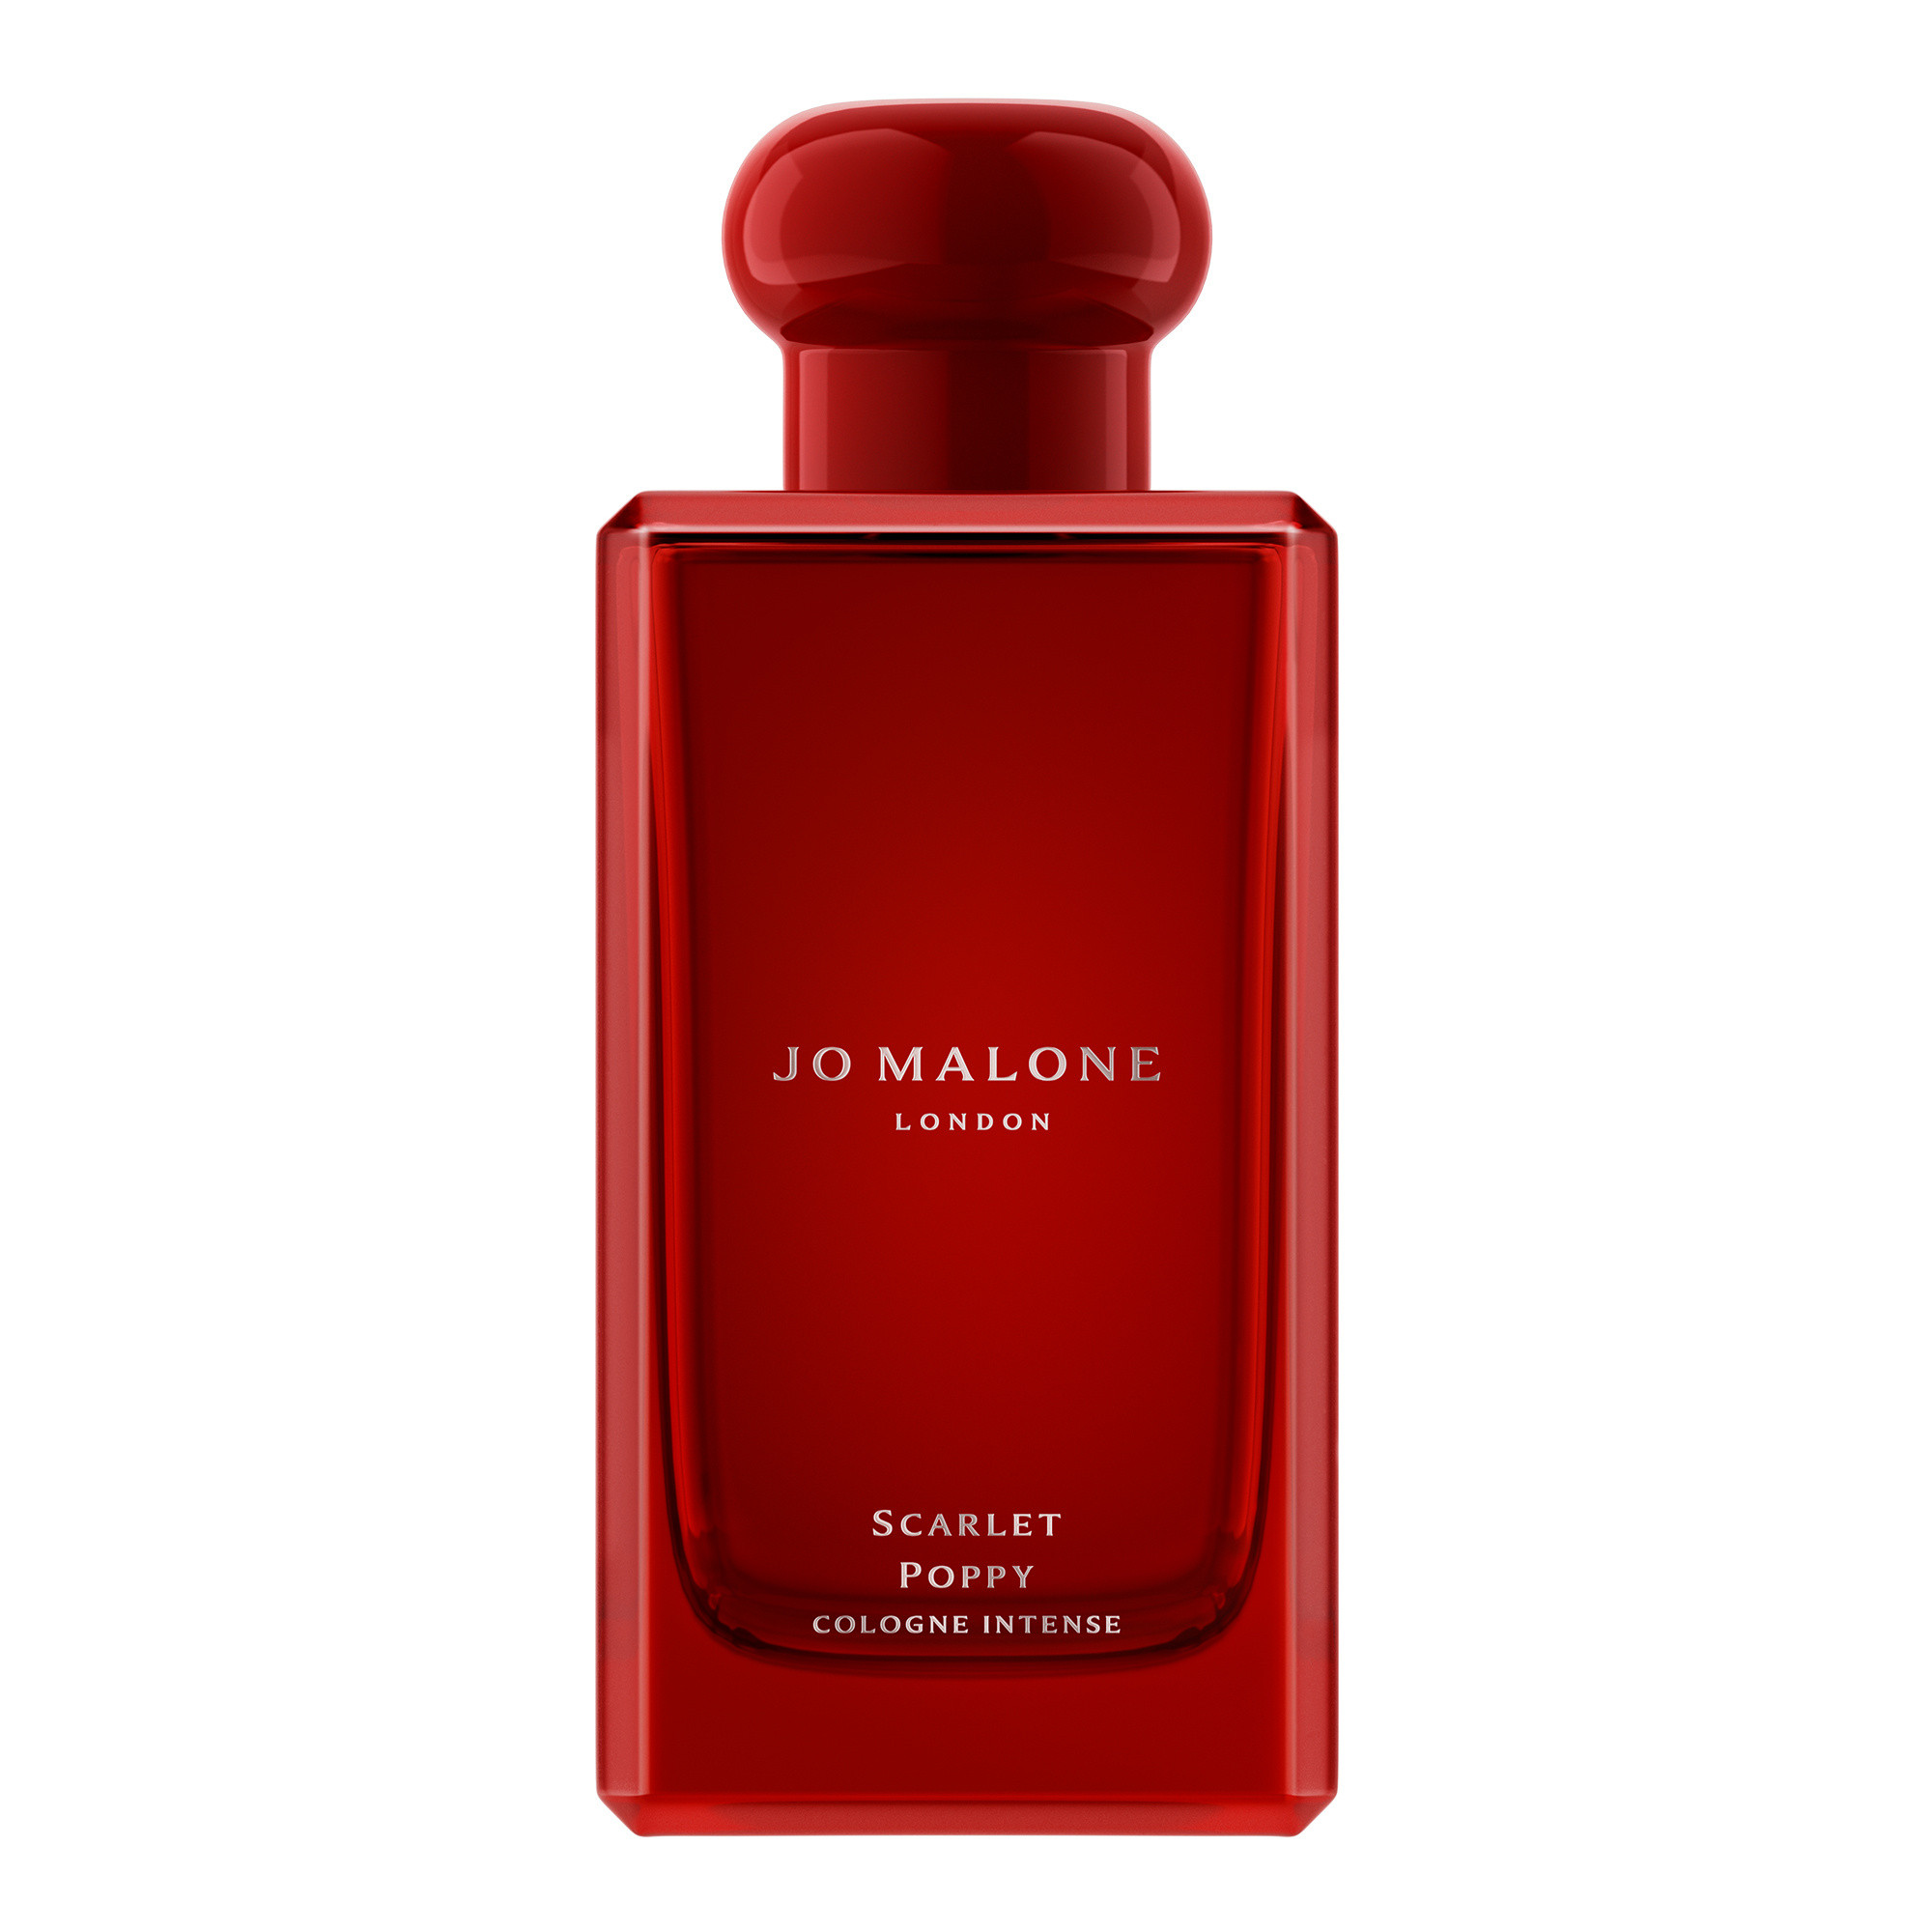 Jo Malone London scarlet poppy cologne intense 100 ml, Beige, large image number 0